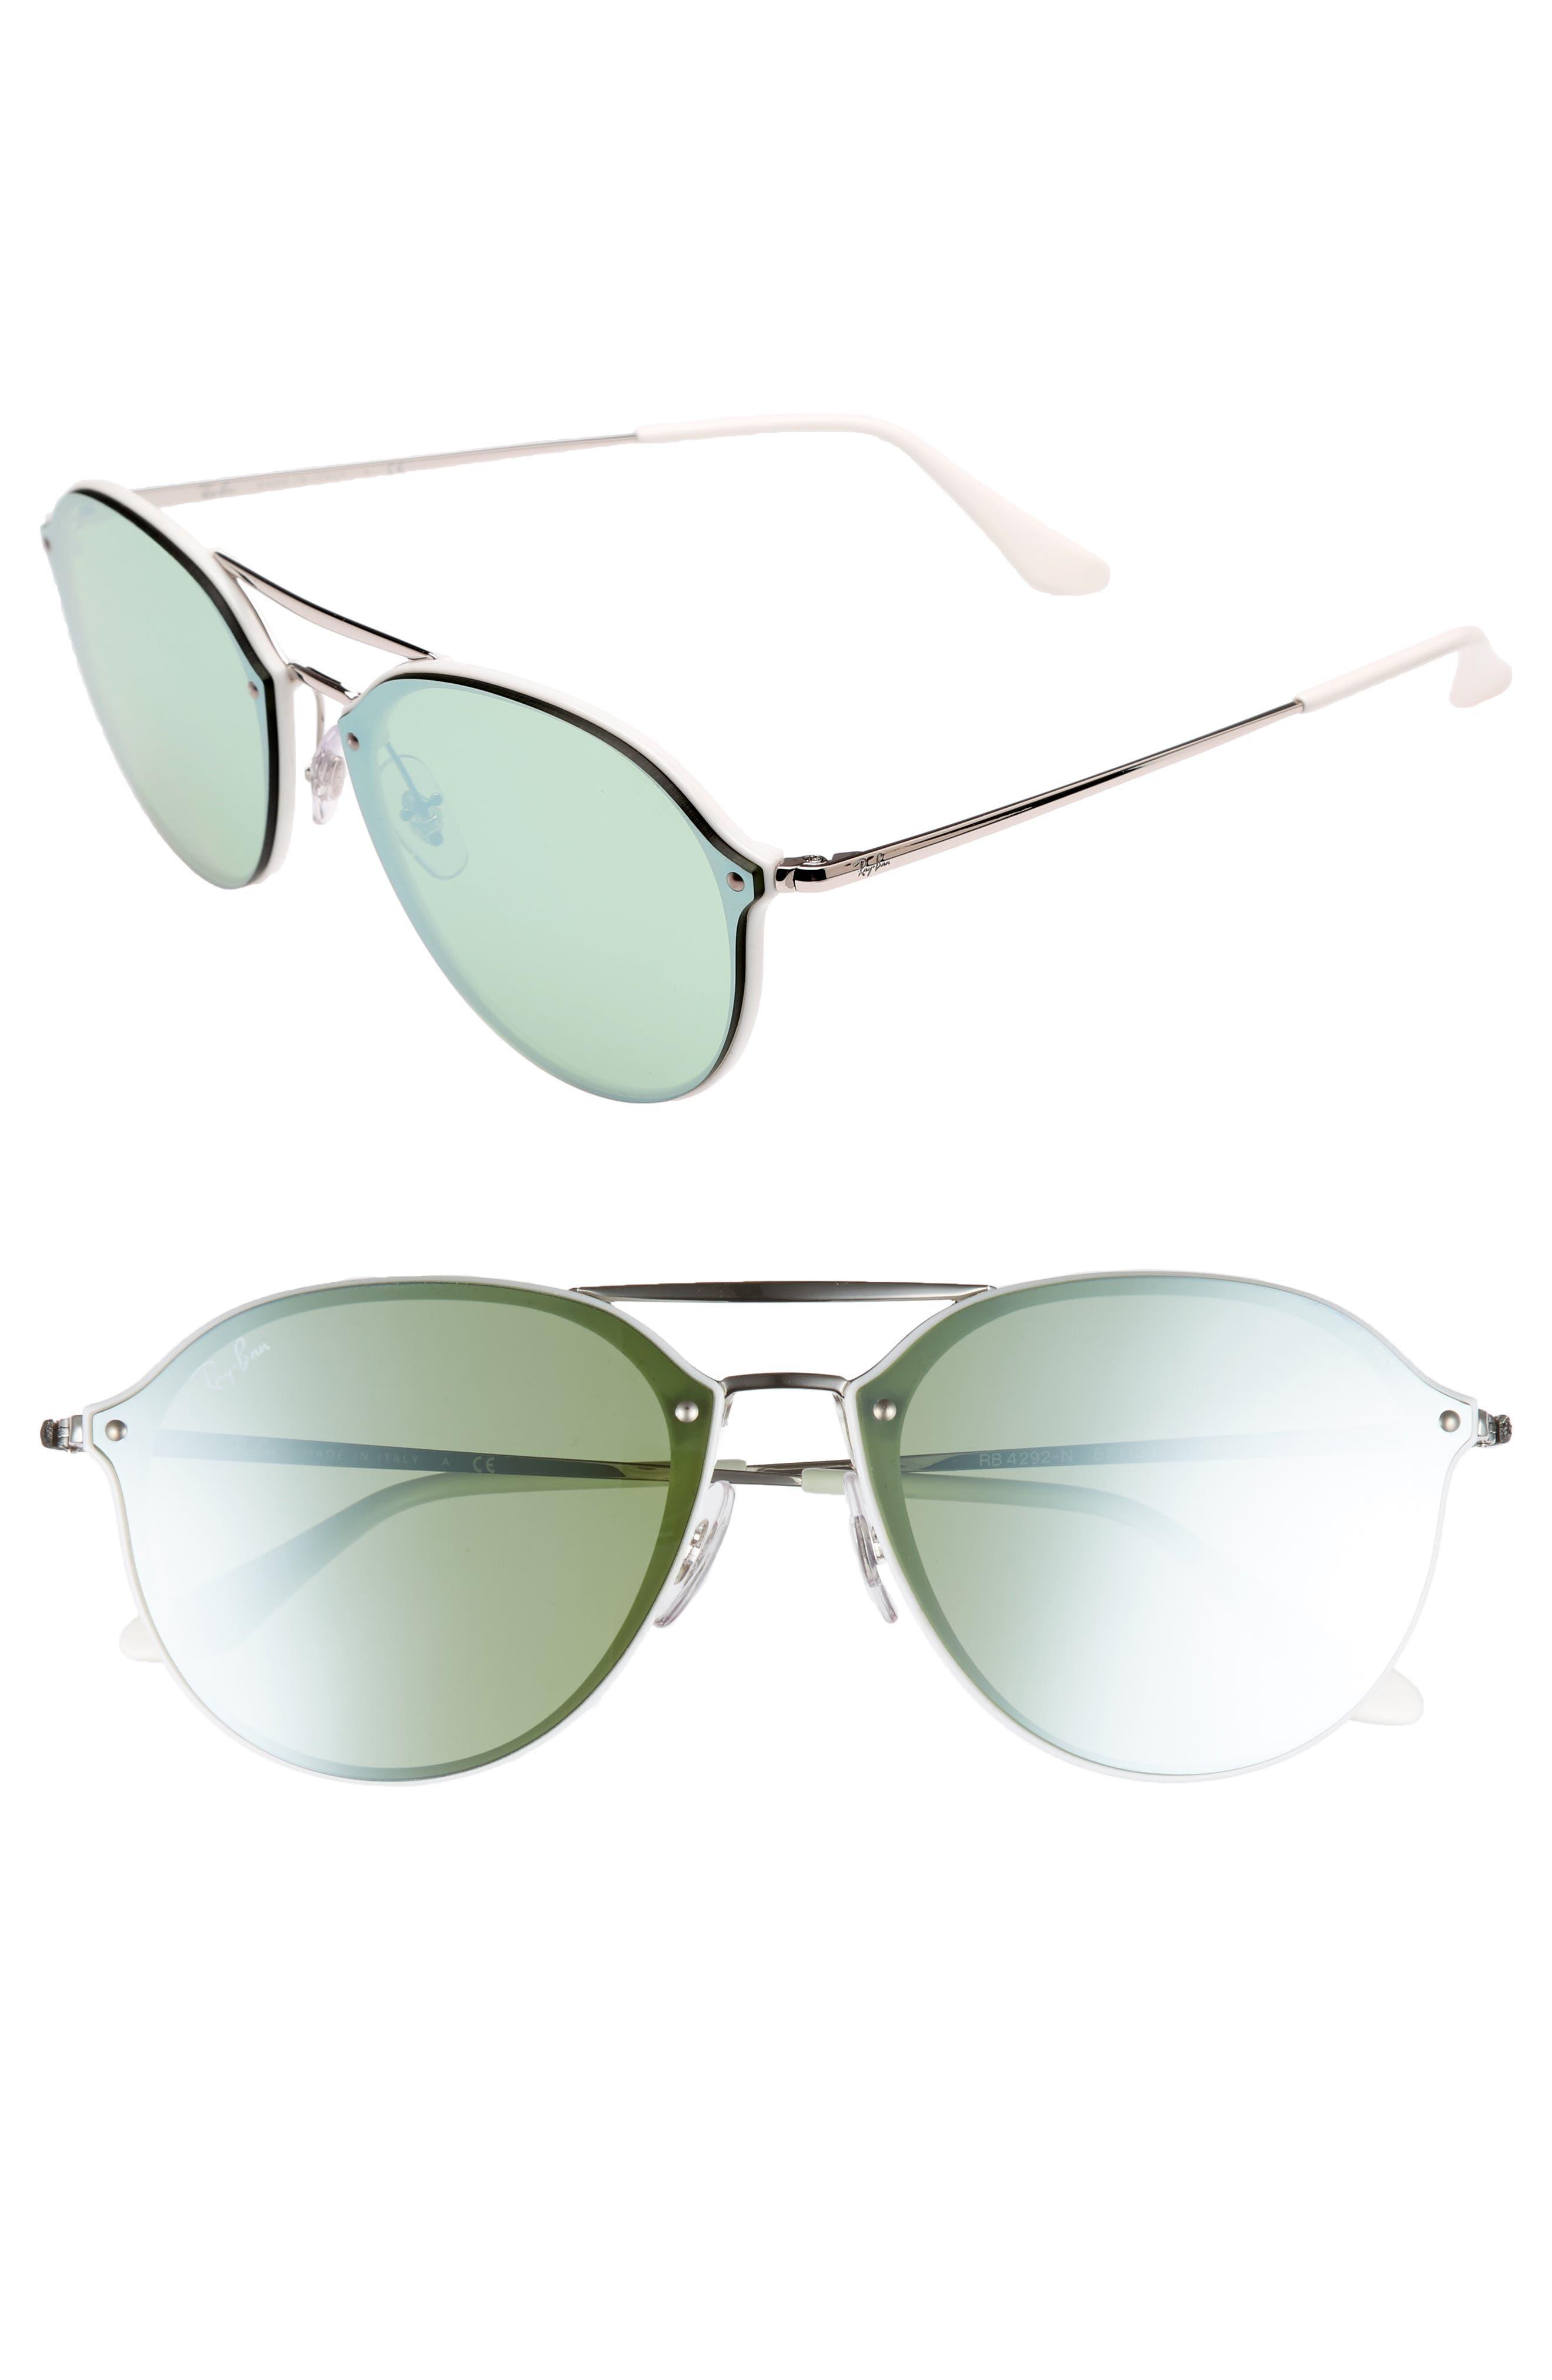 62mm Mirrored Lens Aviator Sunglasses,                             Main thumbnail 1, color,                             100